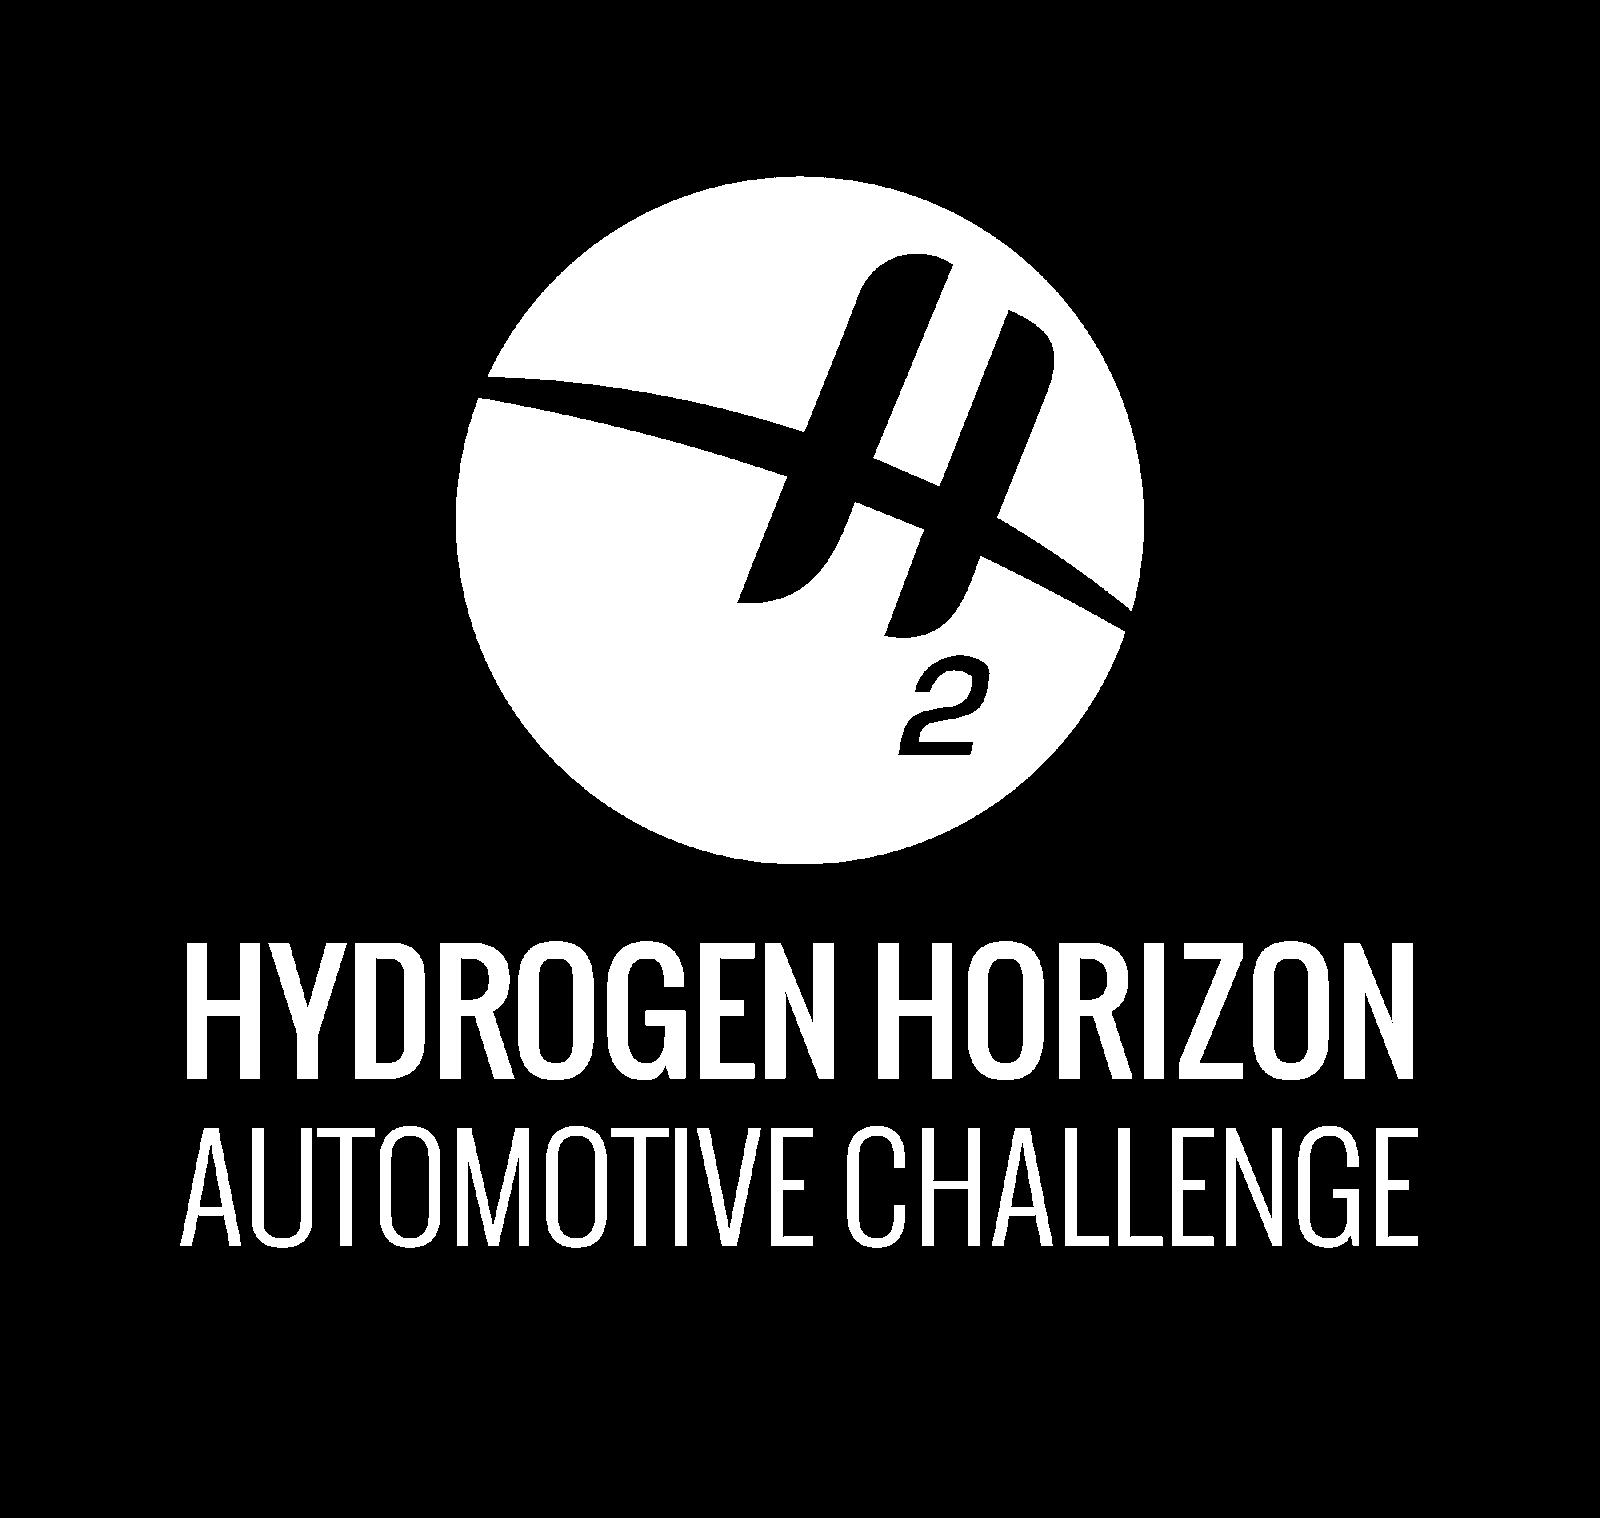 H2 AUTOMOTIVE CHALLENGE